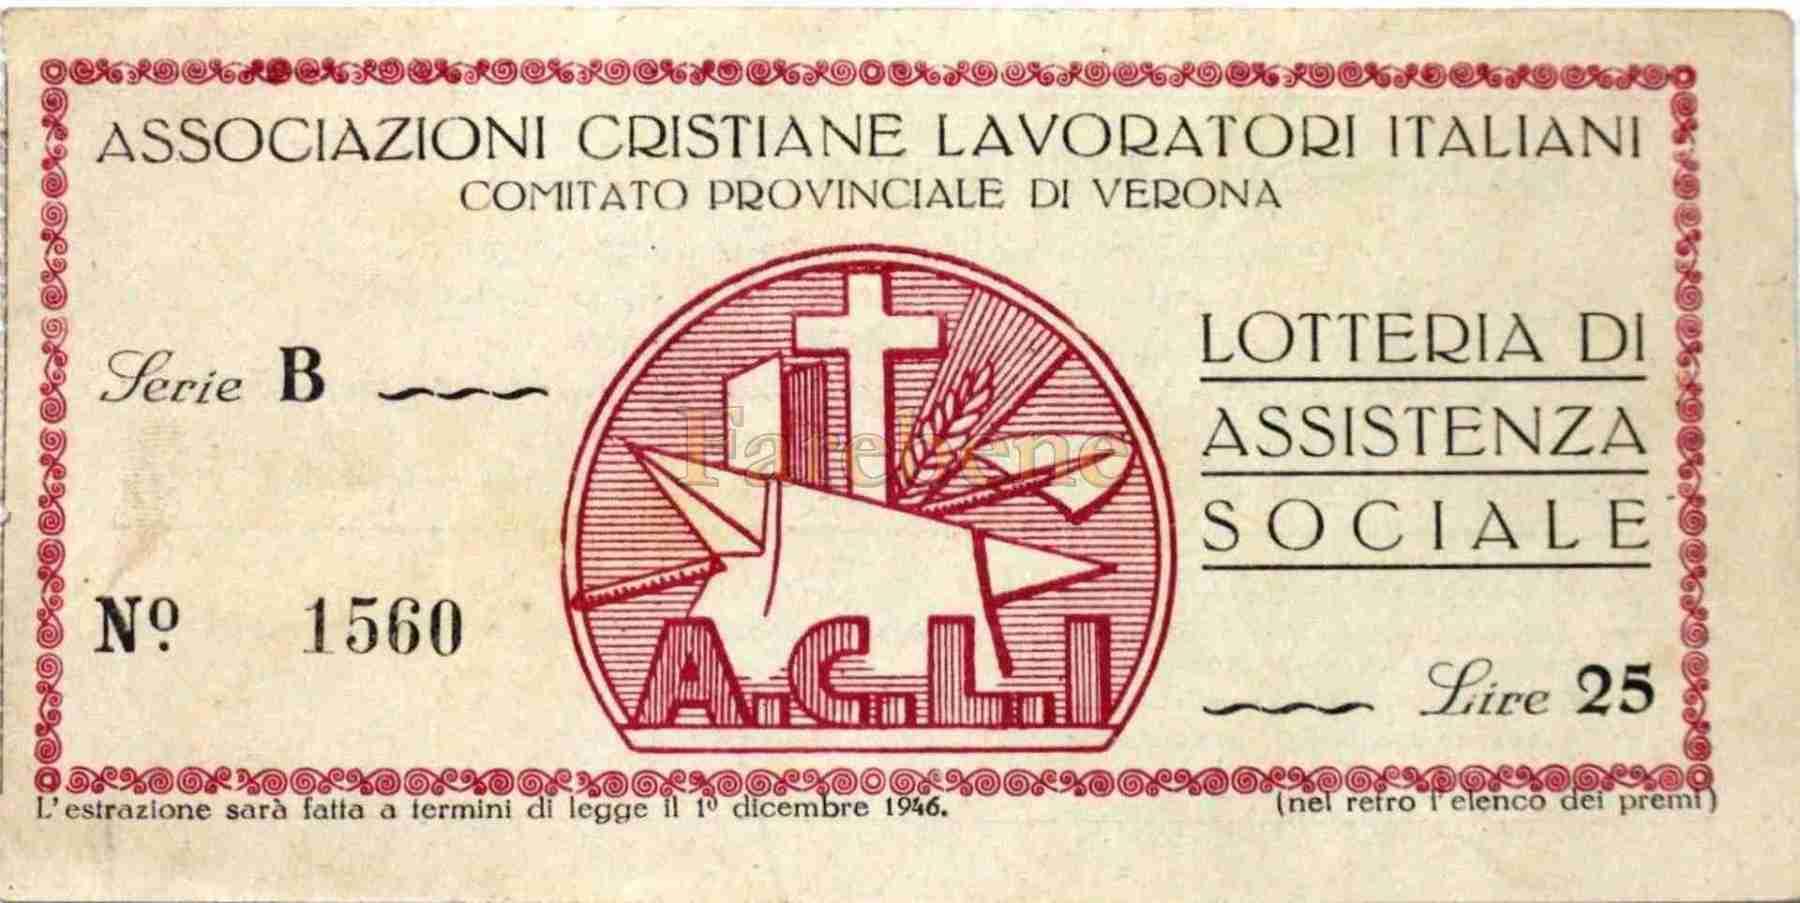 assistenza sociale lotteria verona